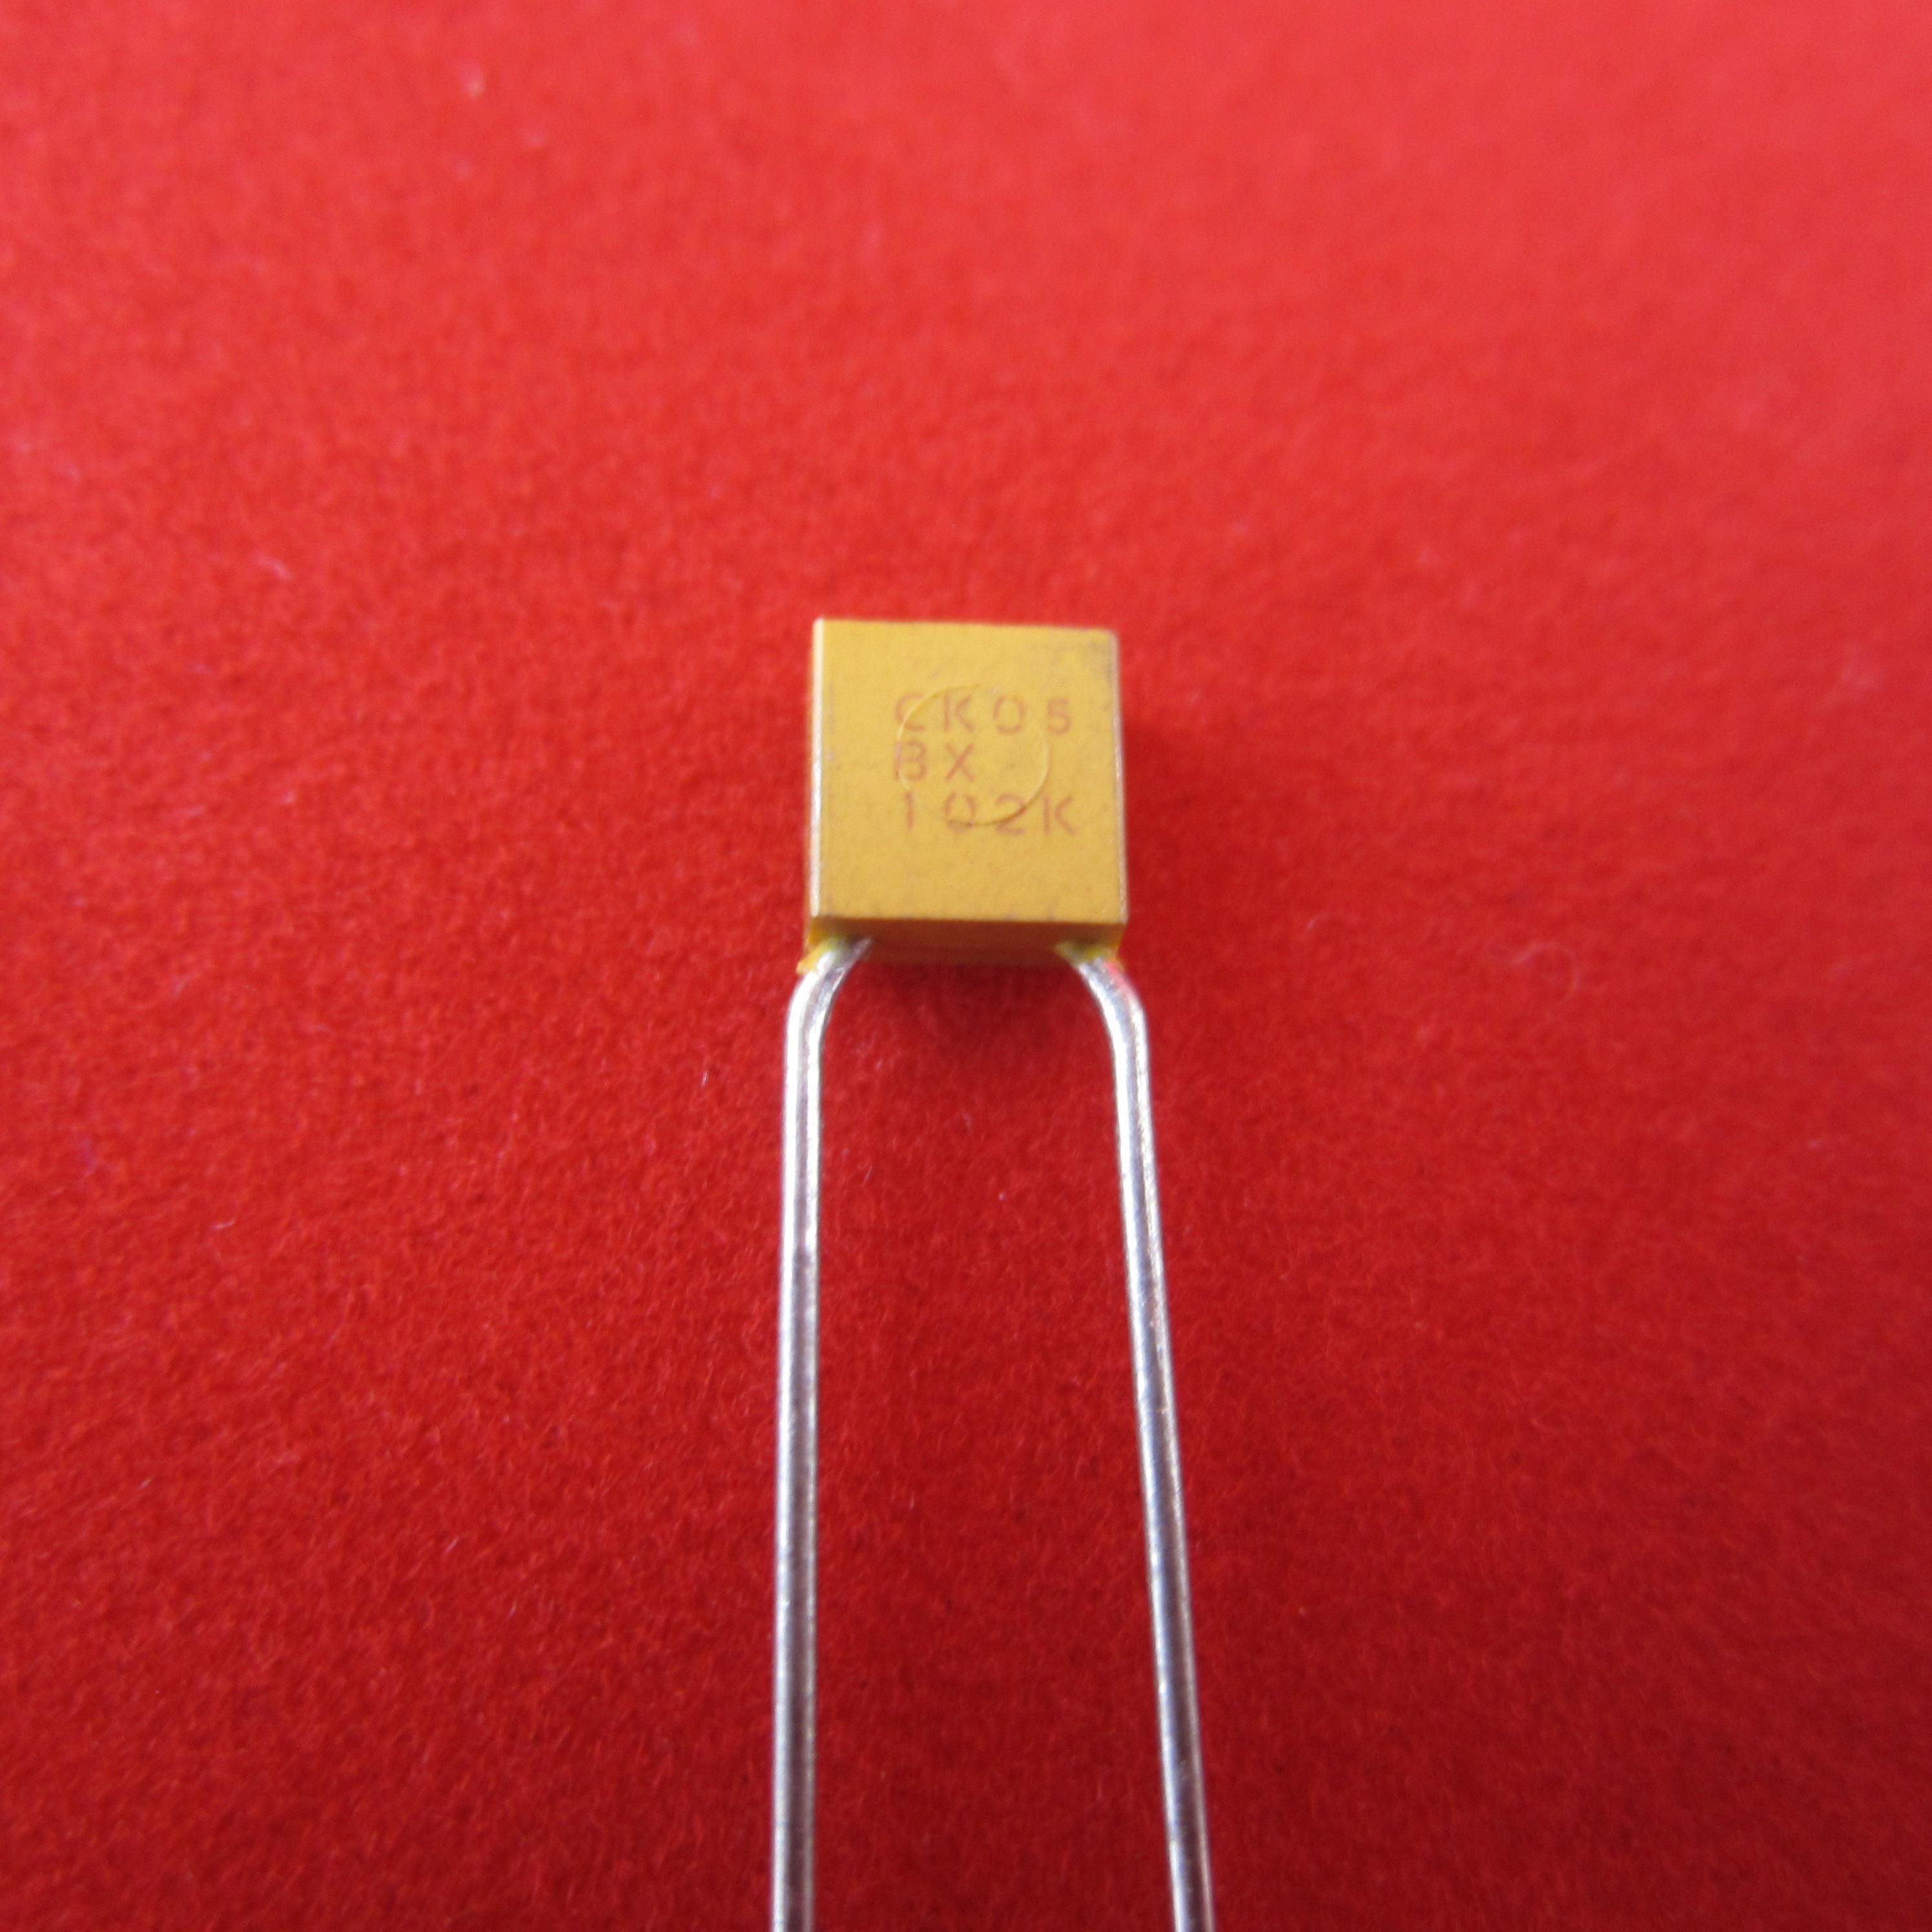 Poly avx capacitors